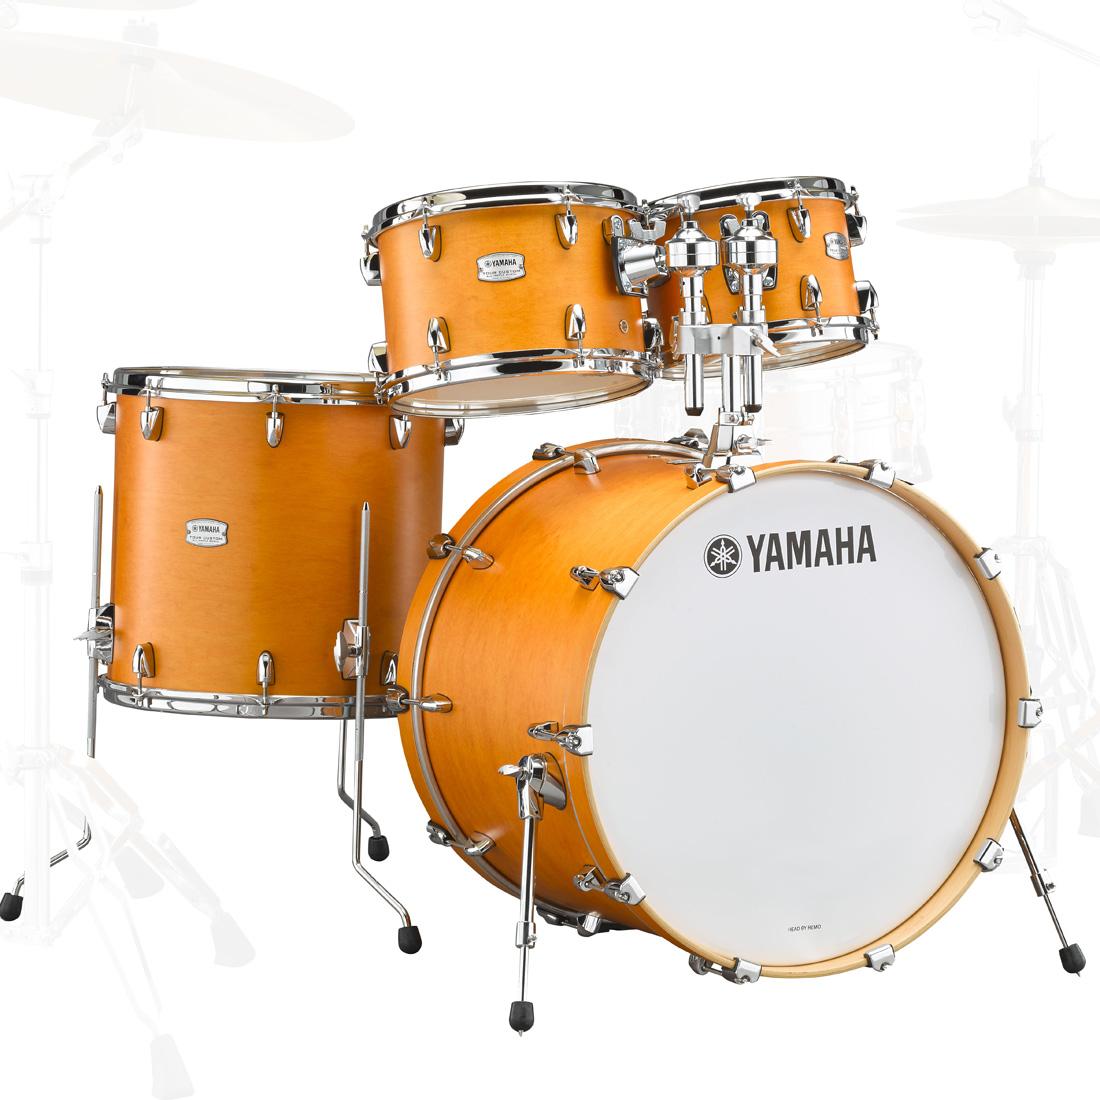 YAMAHA / TMP2F4CRS ヤマハ Tour Custom ドラムシェルパック 22BD キャラメルサテン【お取り寄せ商品】